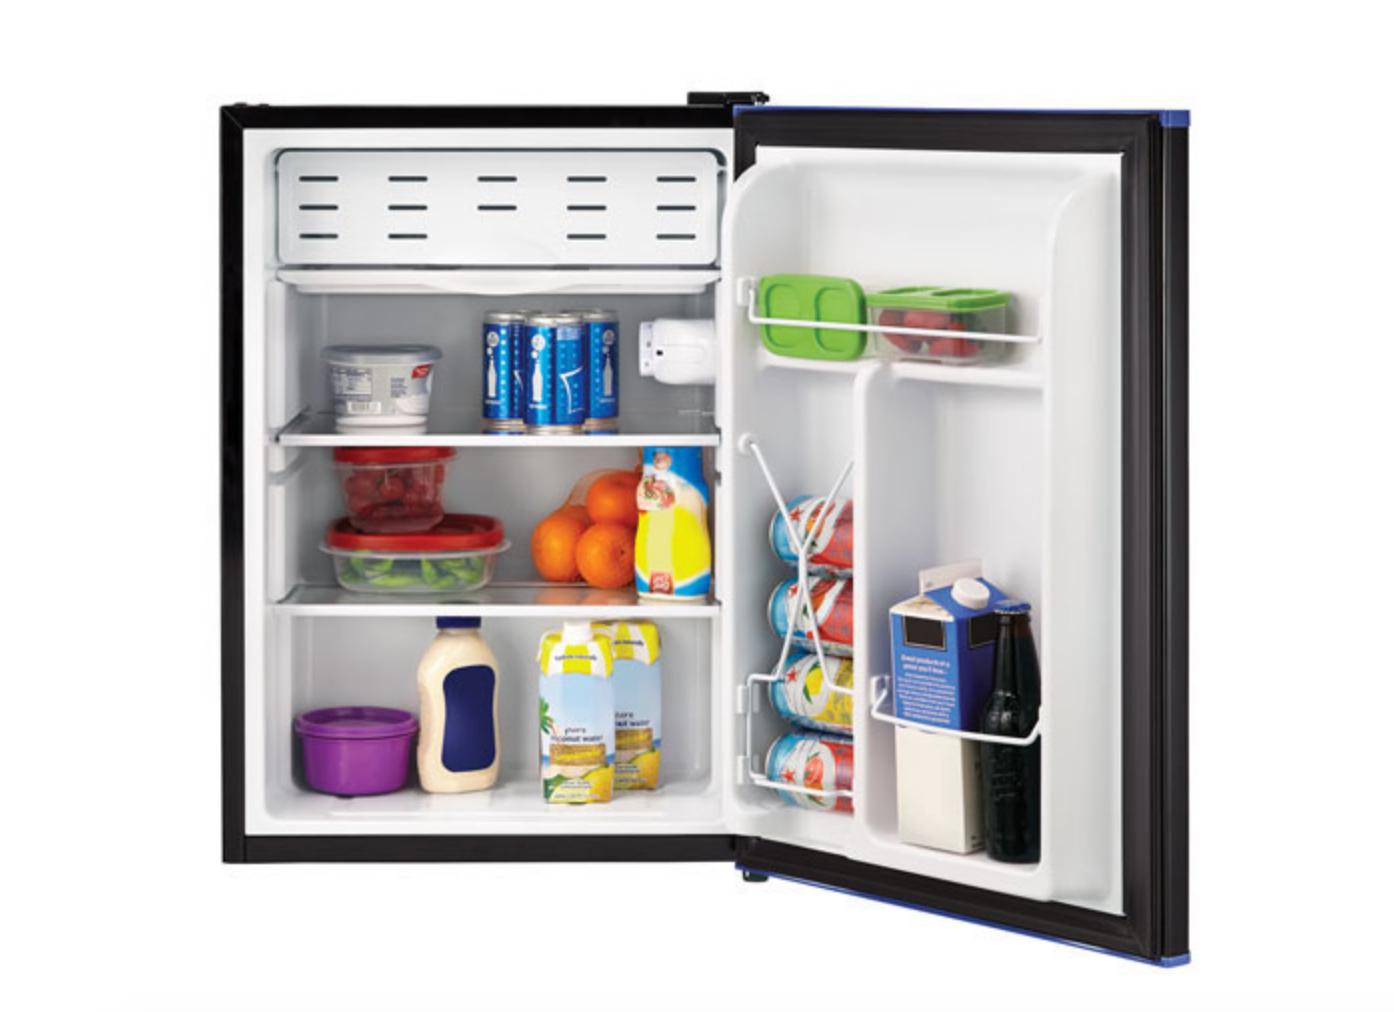 dorm room mini fridge